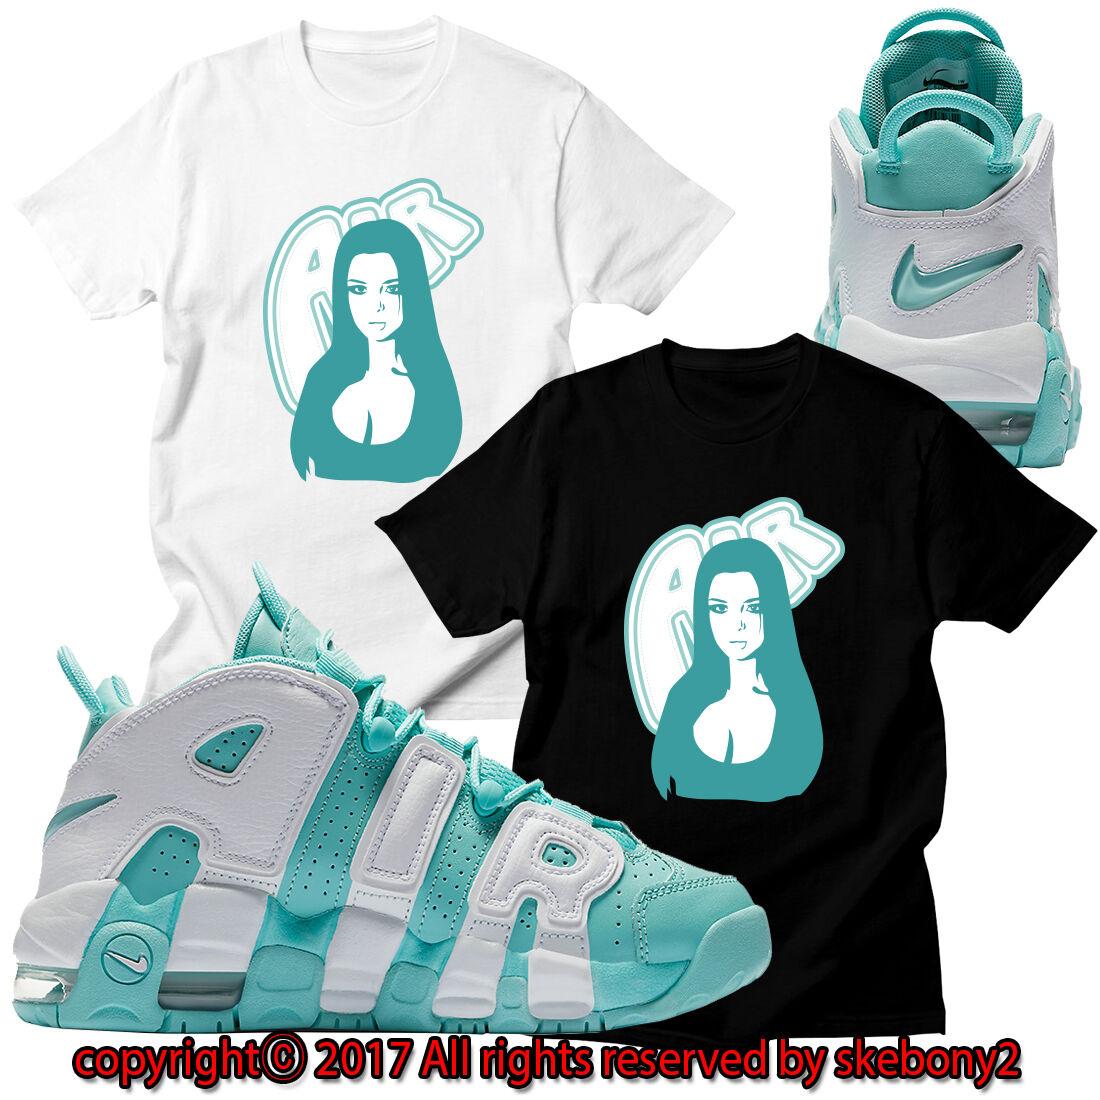 New Custom Tee Nike Air More Uptempo Matching T Shirt Utp 1 9 15